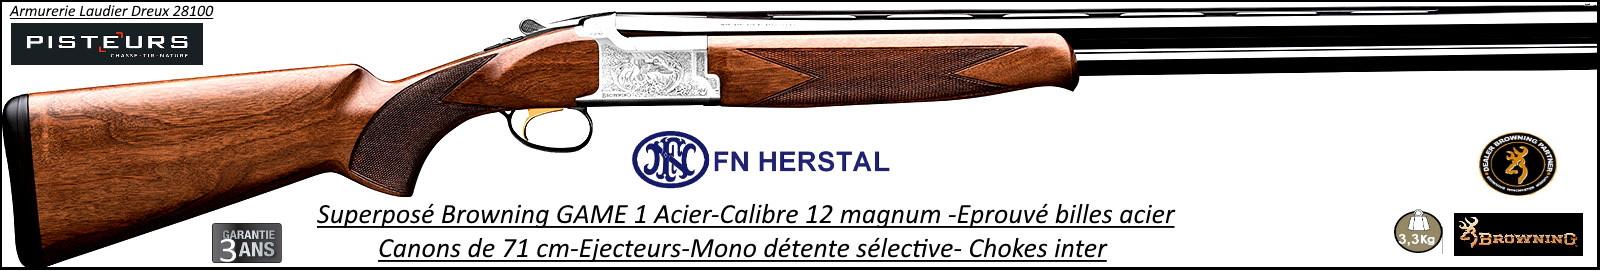 Superposé Browning B525 Game 1 Calibre 12 Magnum Canons 71cm-Ref 20892